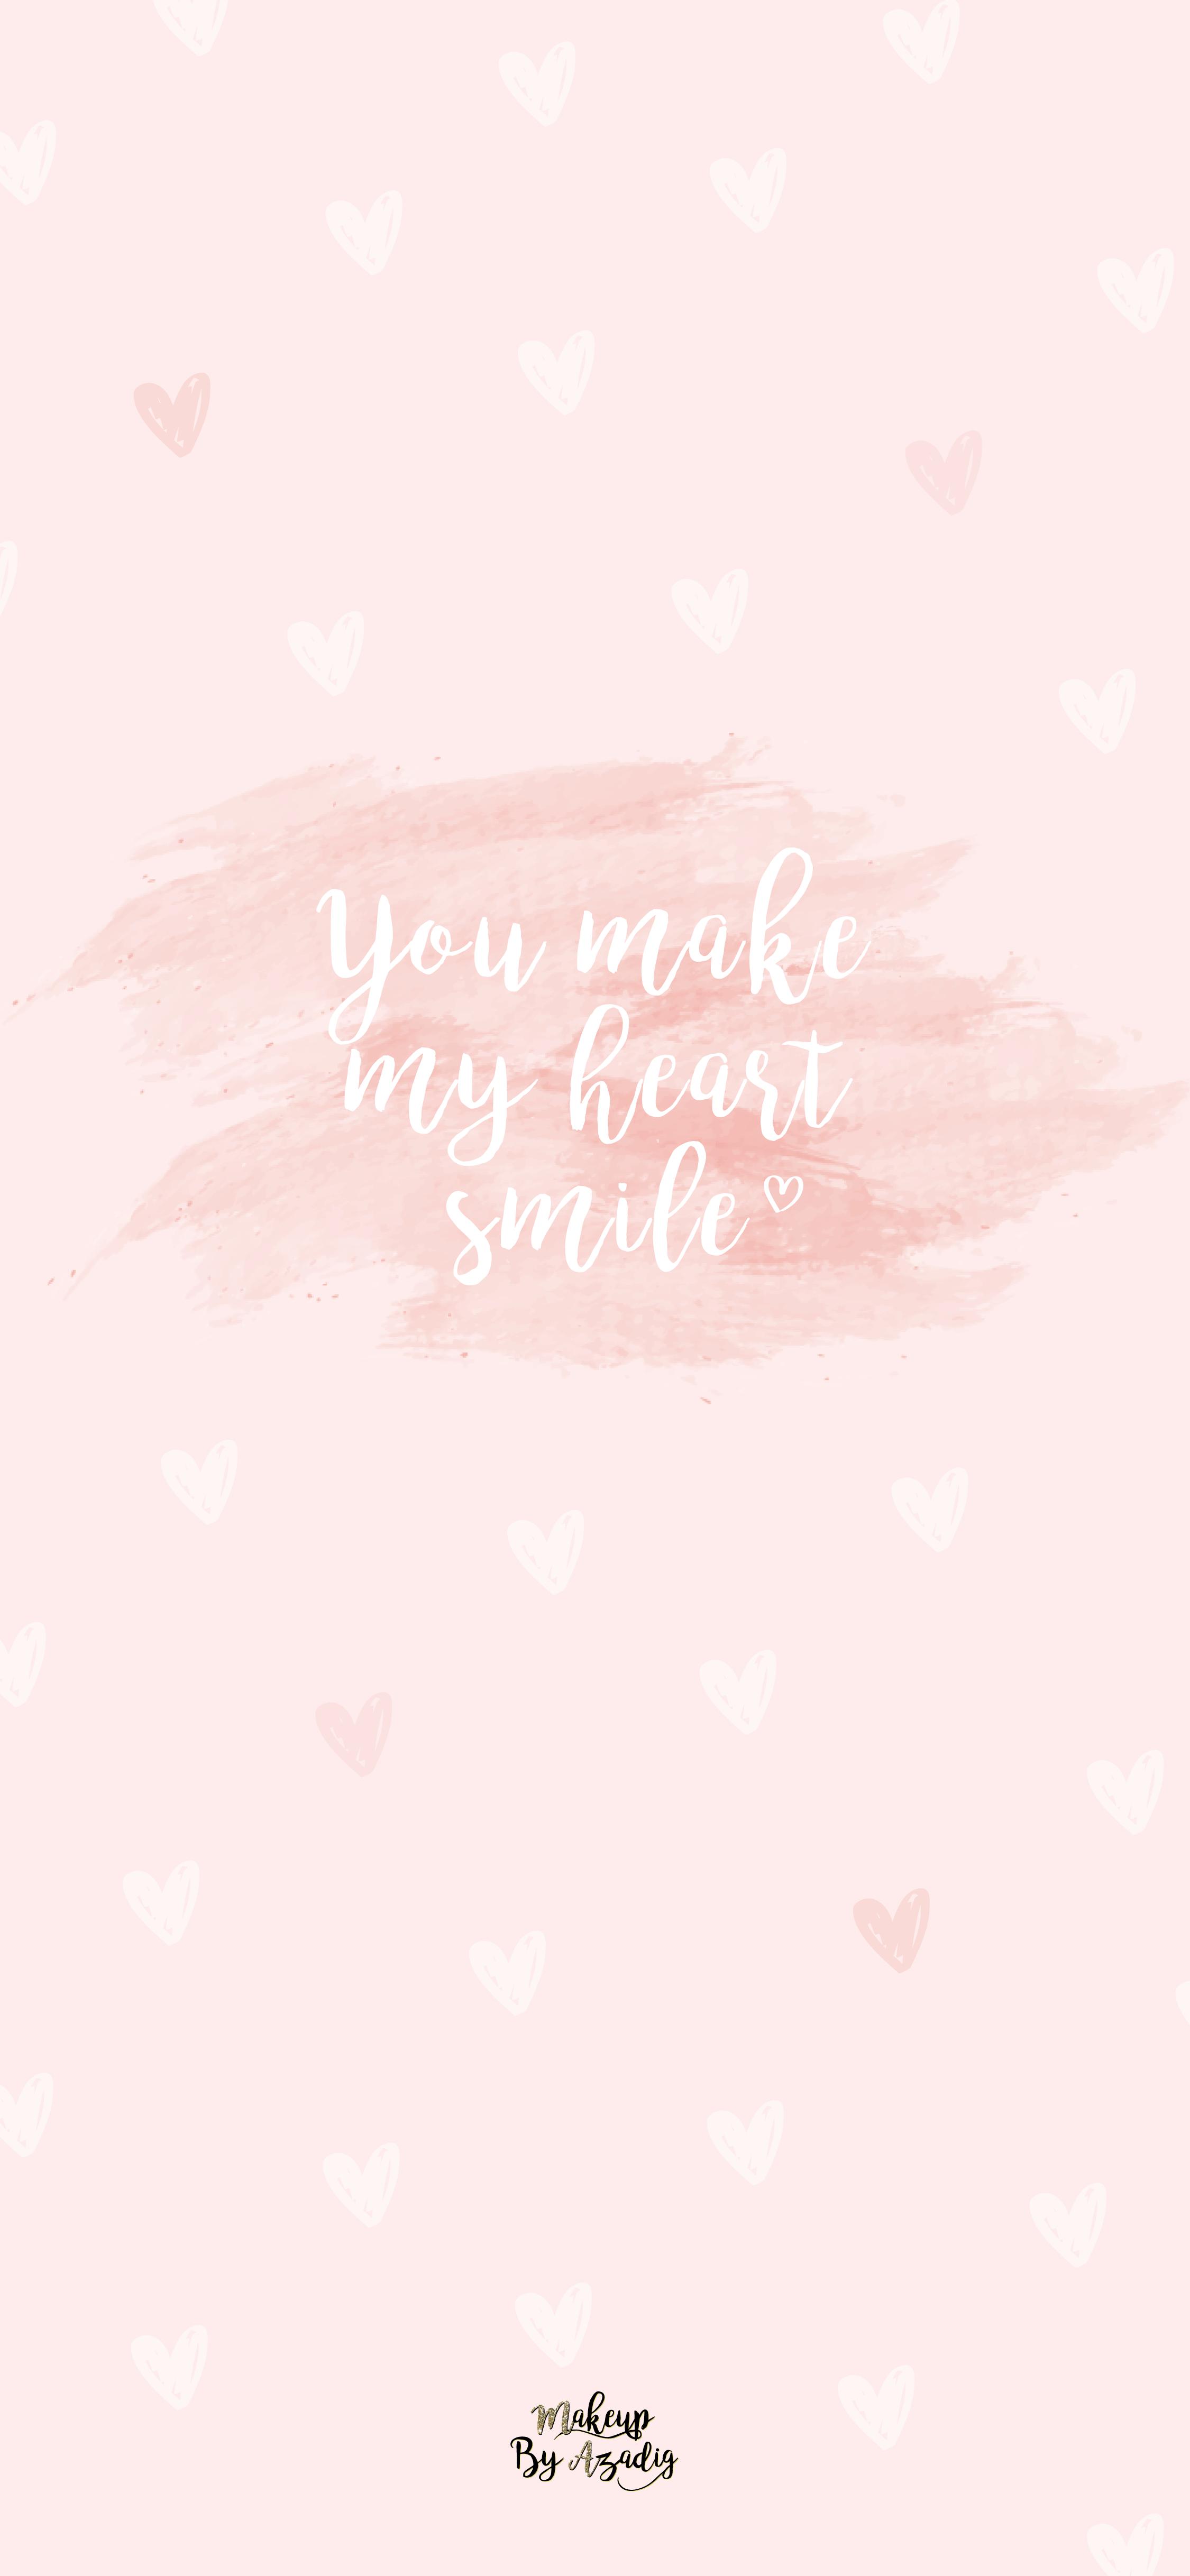 fond-decran-wallpaper-coeur-love-amour-citation-you-make-my-heart-smile-rose-girly-iphone-X-makeupbyazadig-tendance